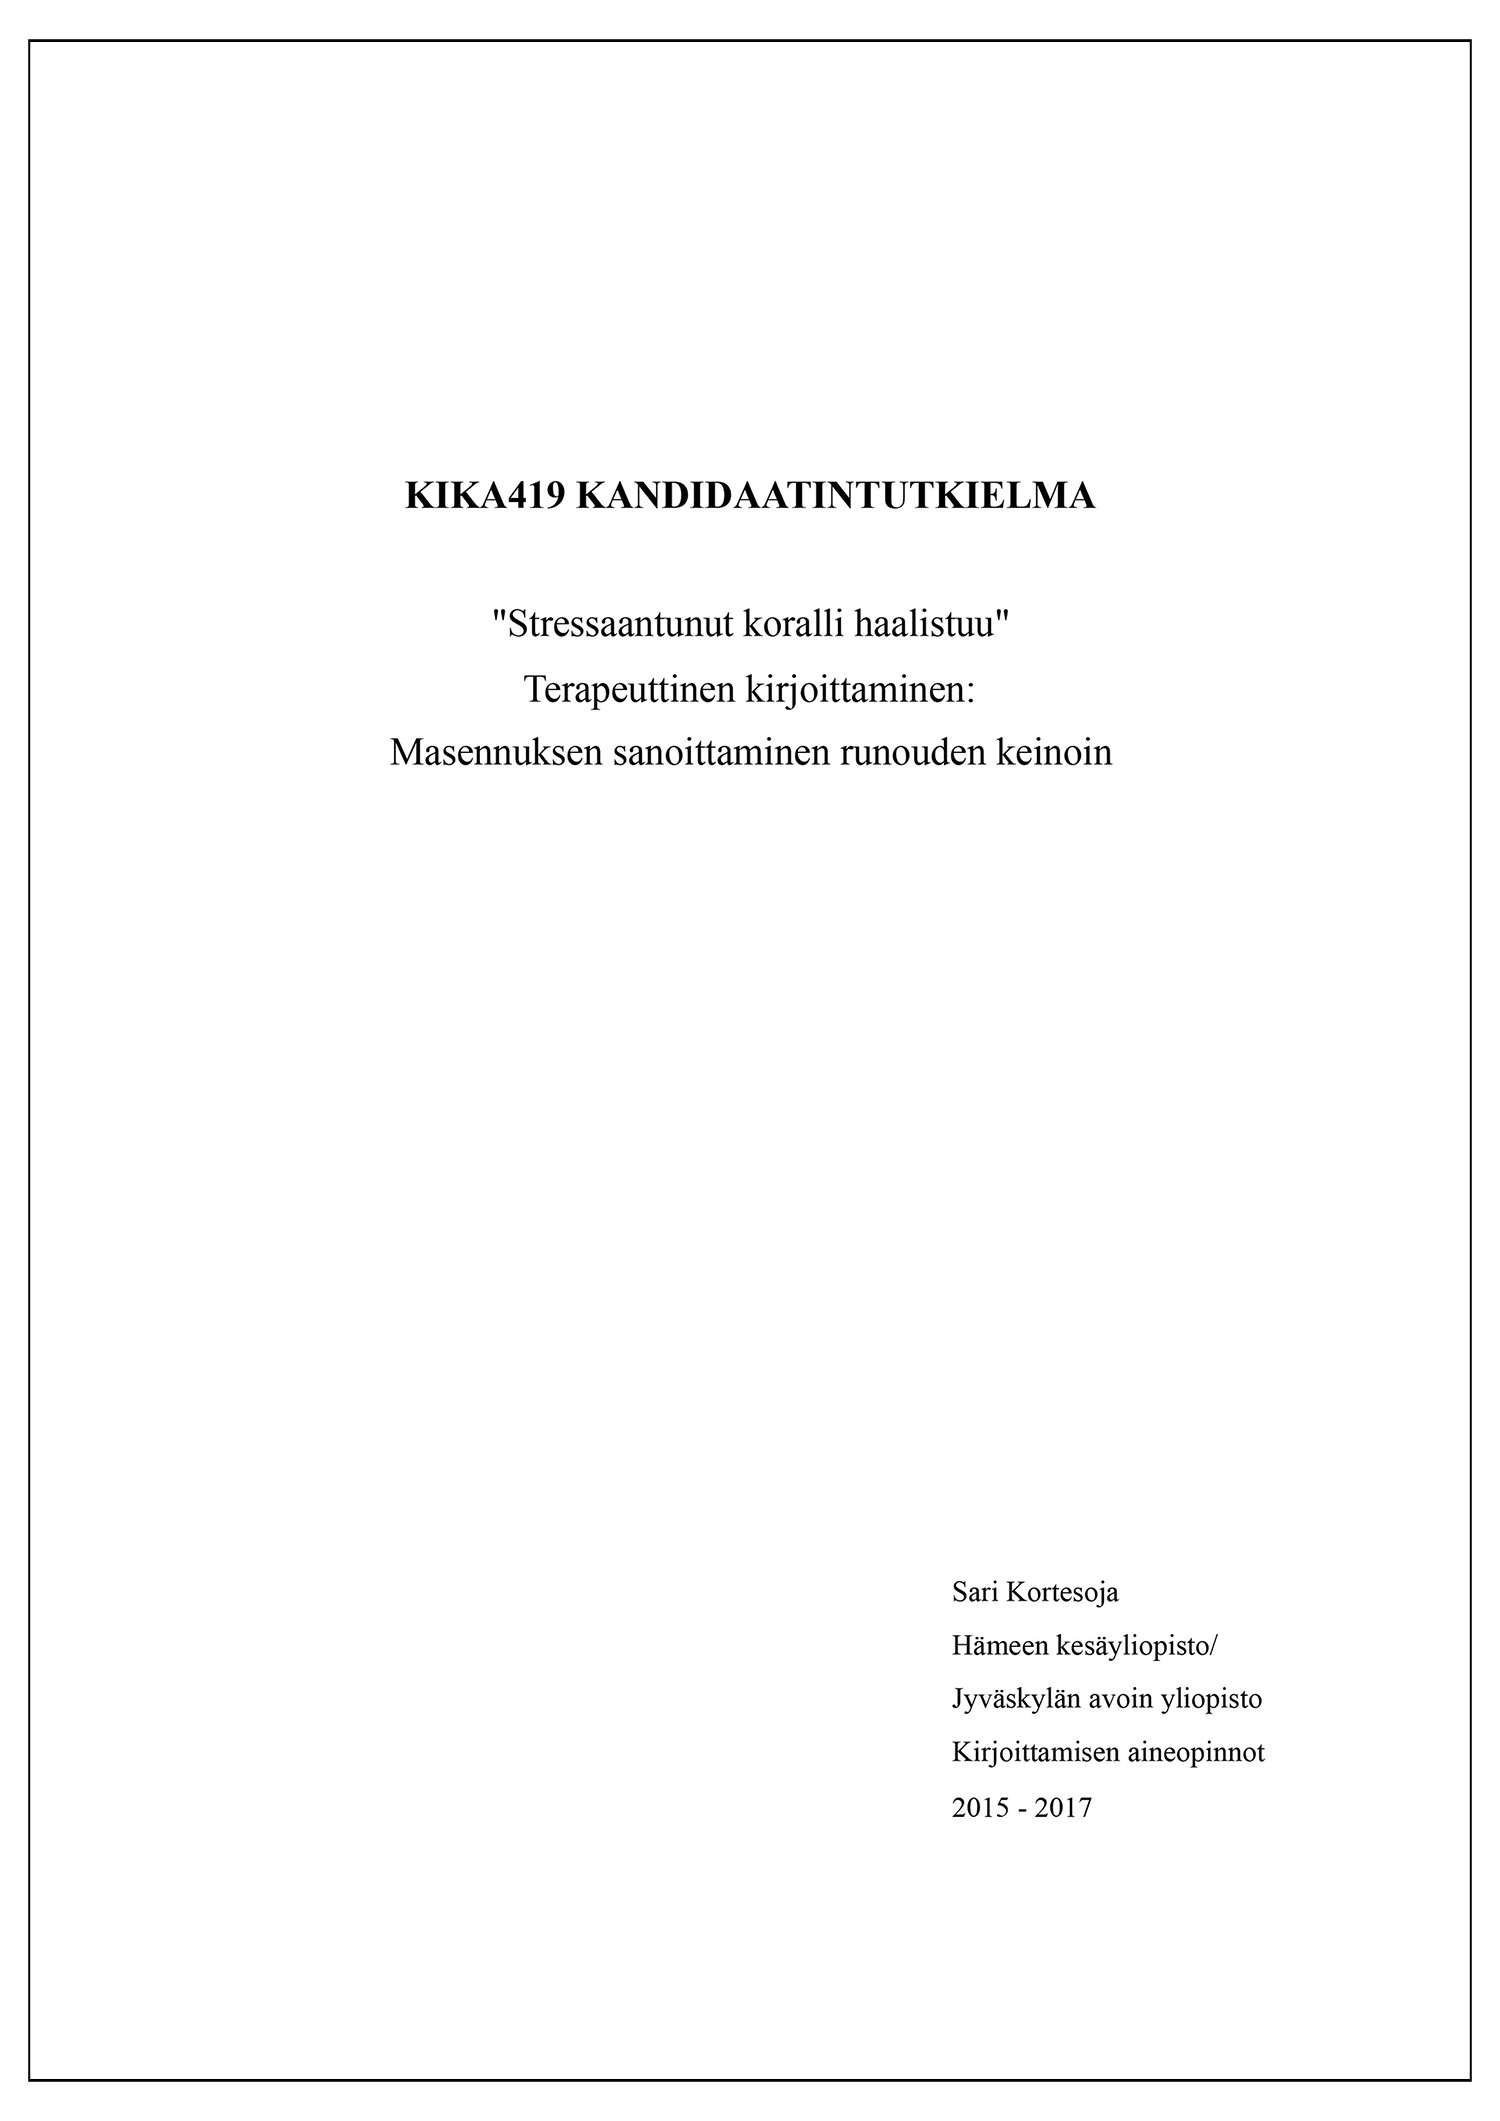 KIKA419Kandidaatintutkielma_SariKortesoja-2.jpg